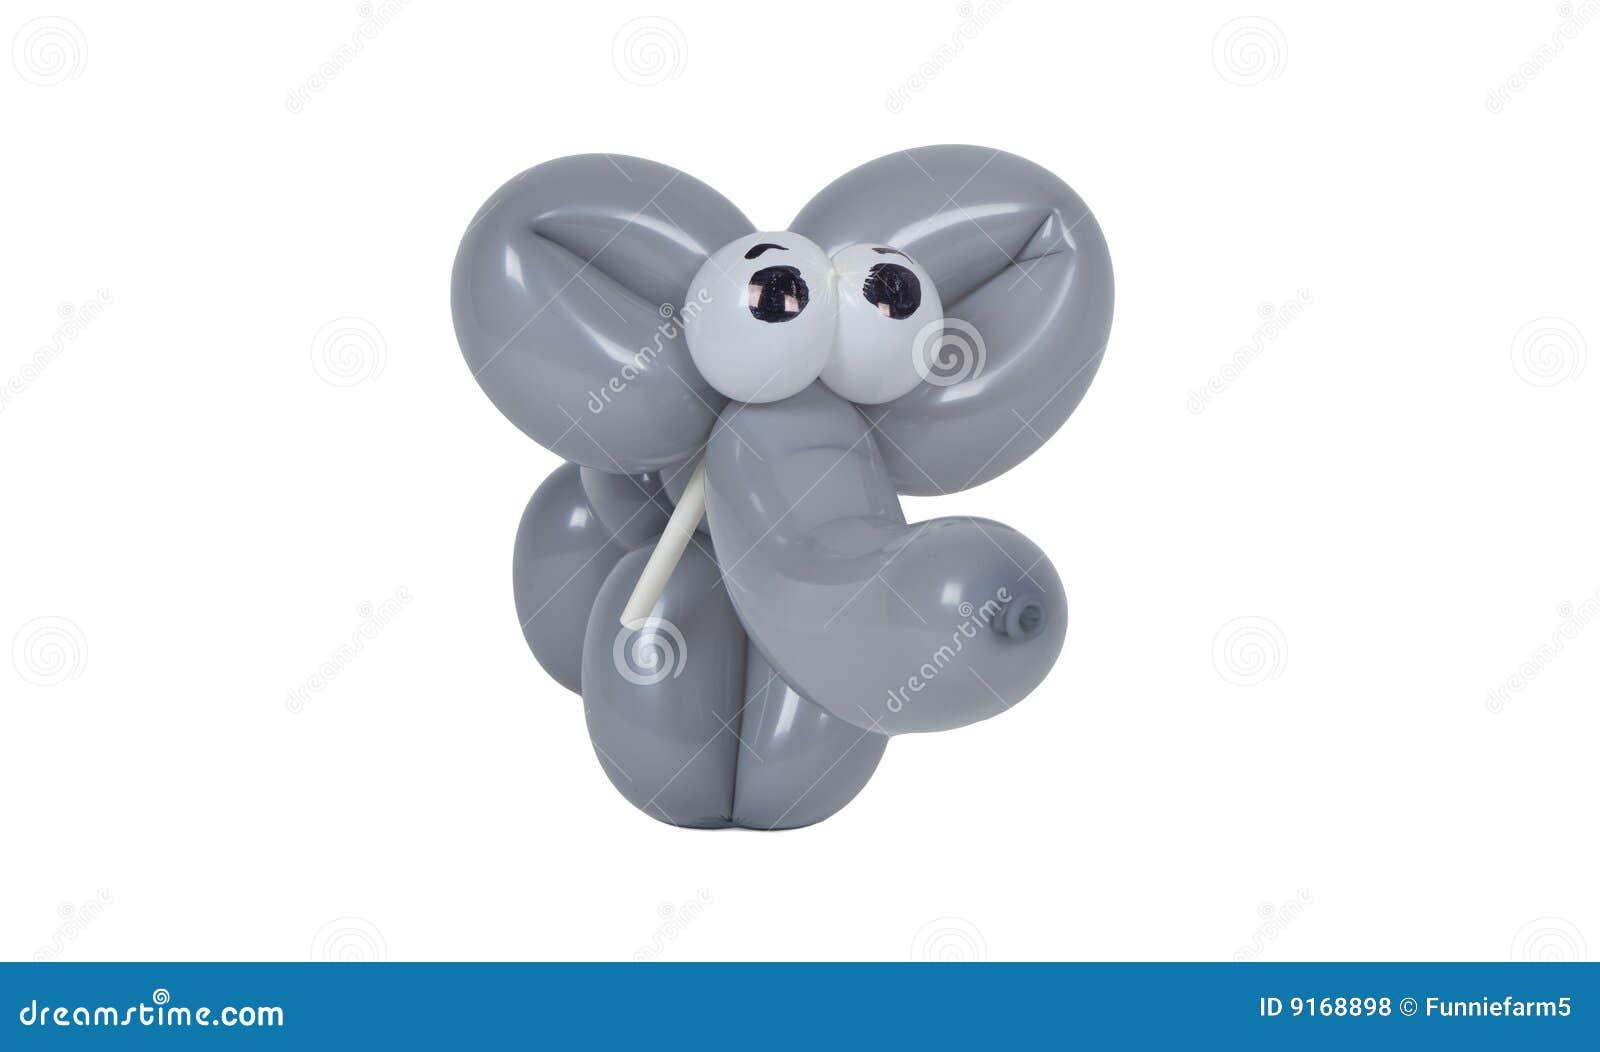 Balloon elephant with eyes royalty free stock photos image 9168898